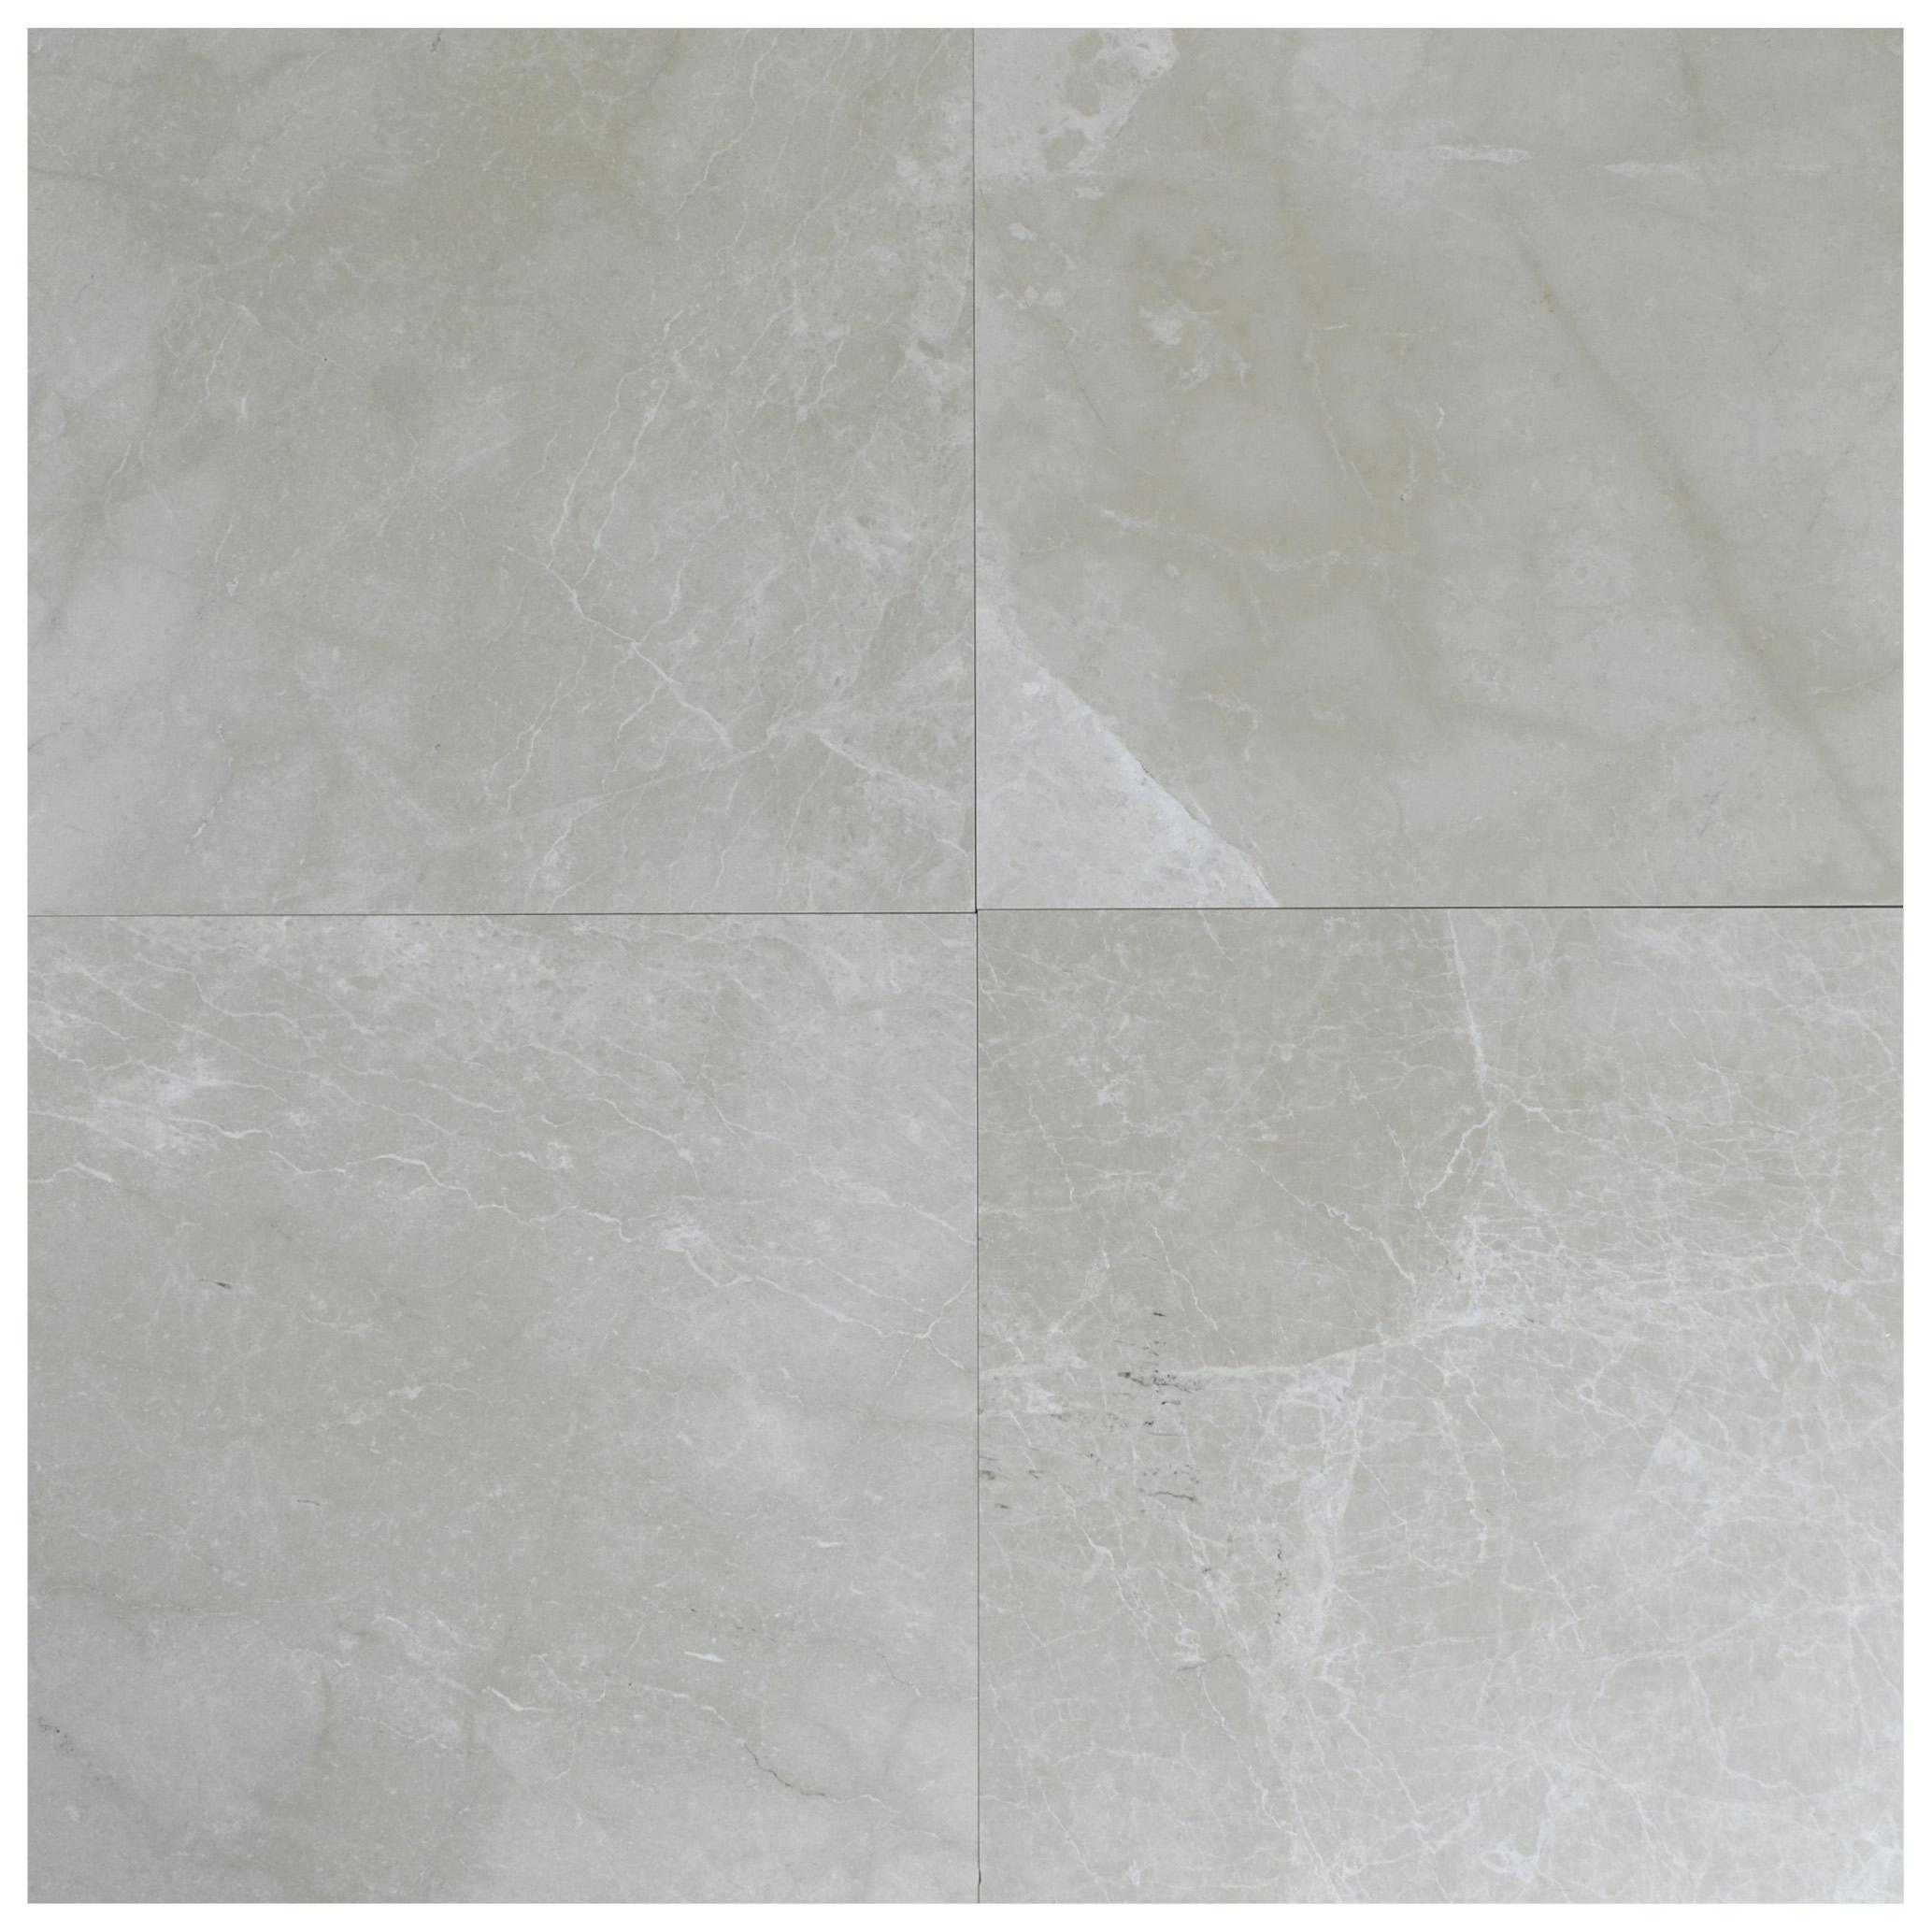 botticino beige B polished marble tiles 18X18-marble sale-Atlantic Stone Source